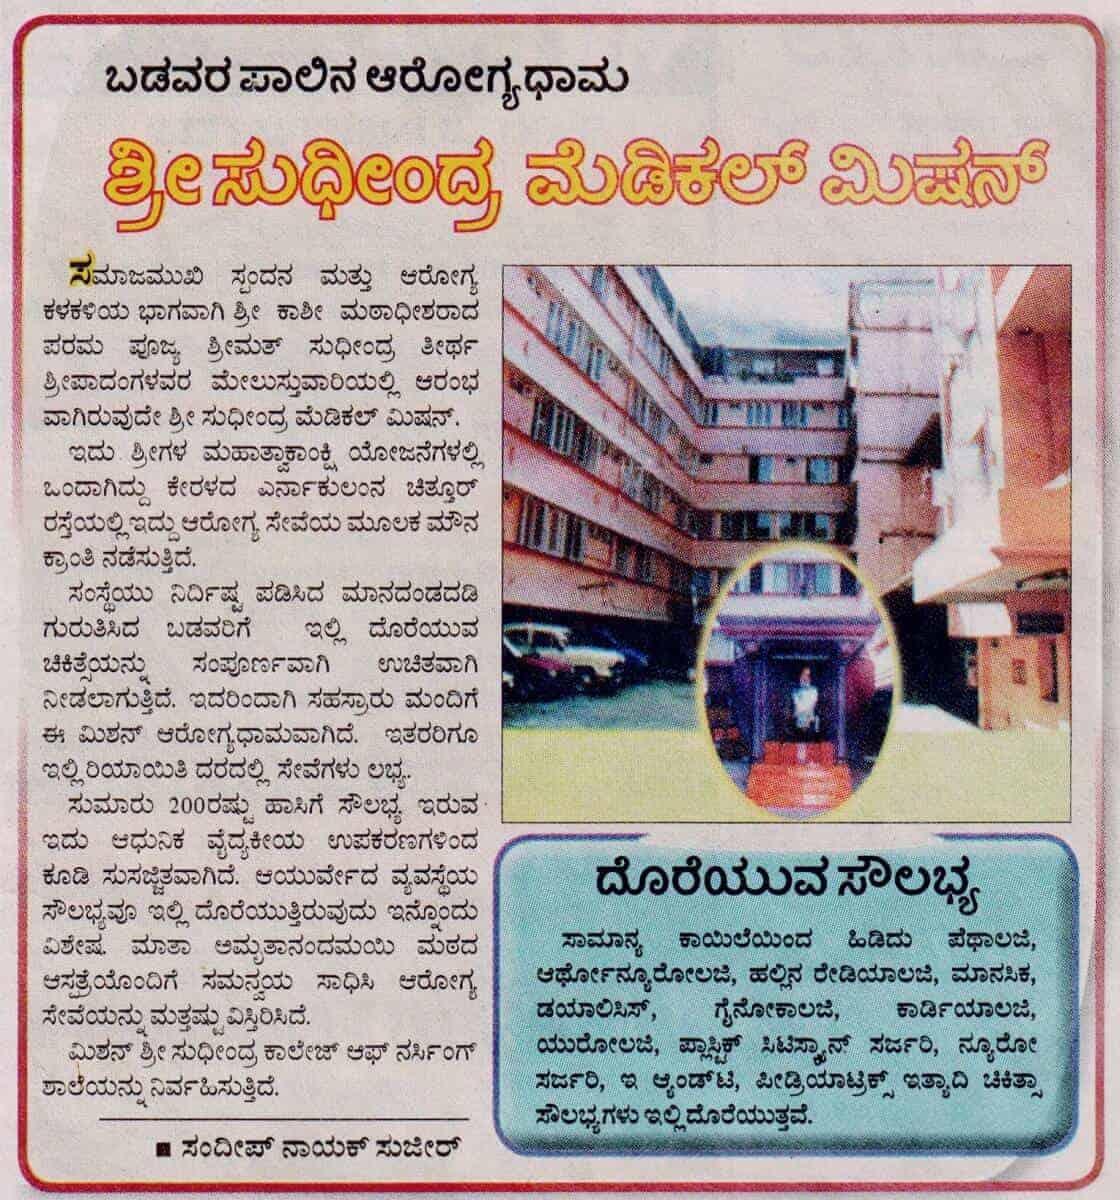 Sri Sudhindra Medical Mission